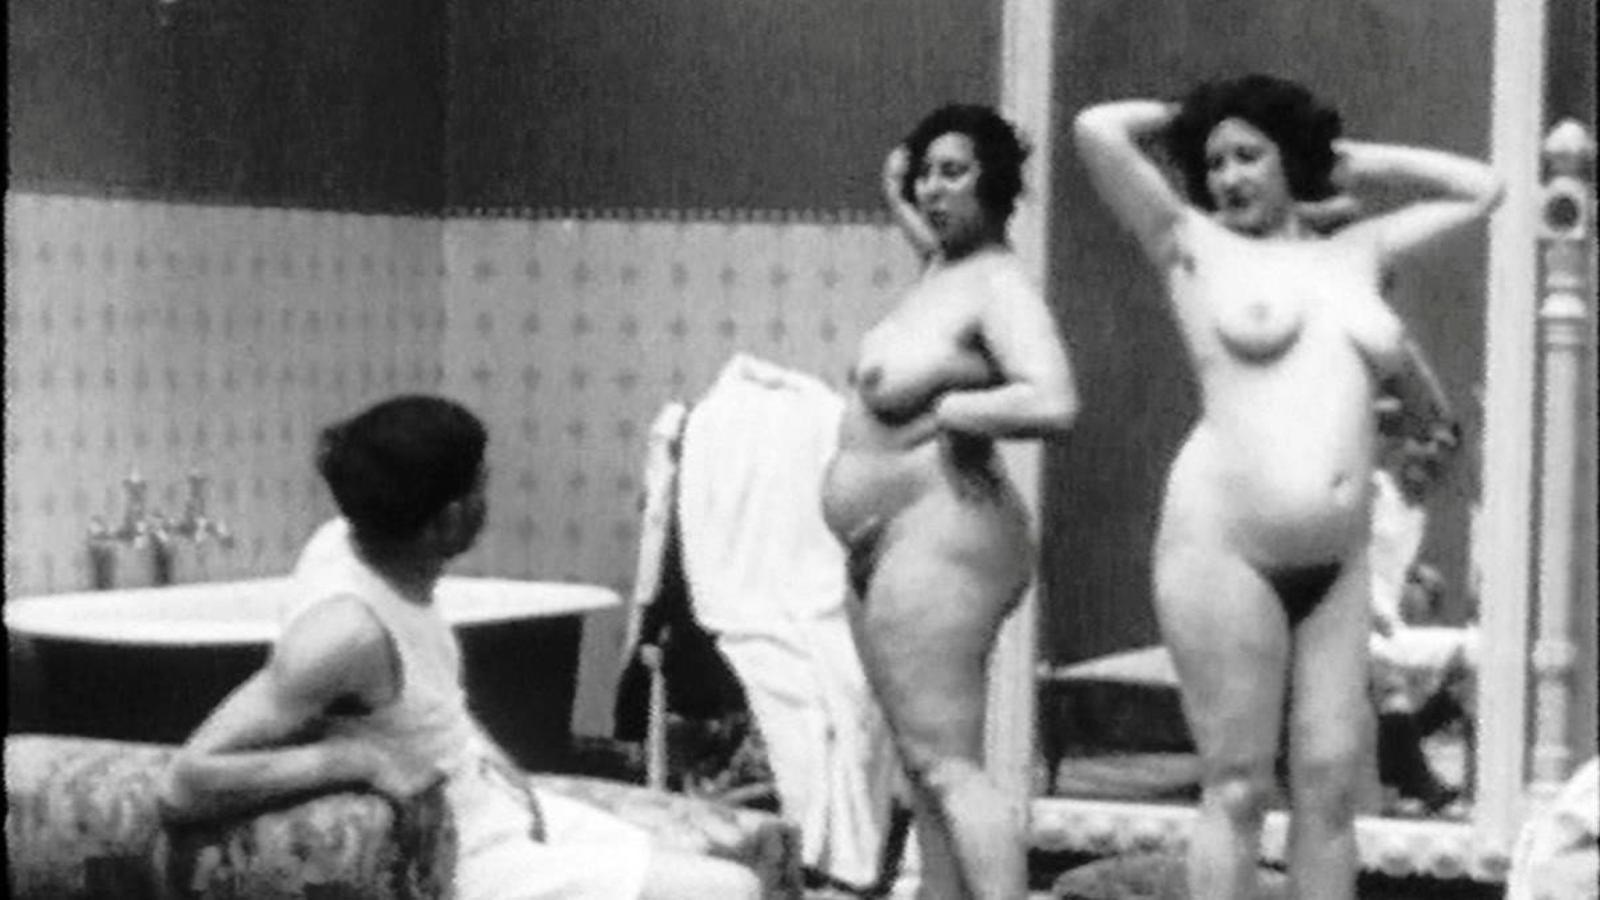 Una de les pel·lícules porno del monarca espanyol.